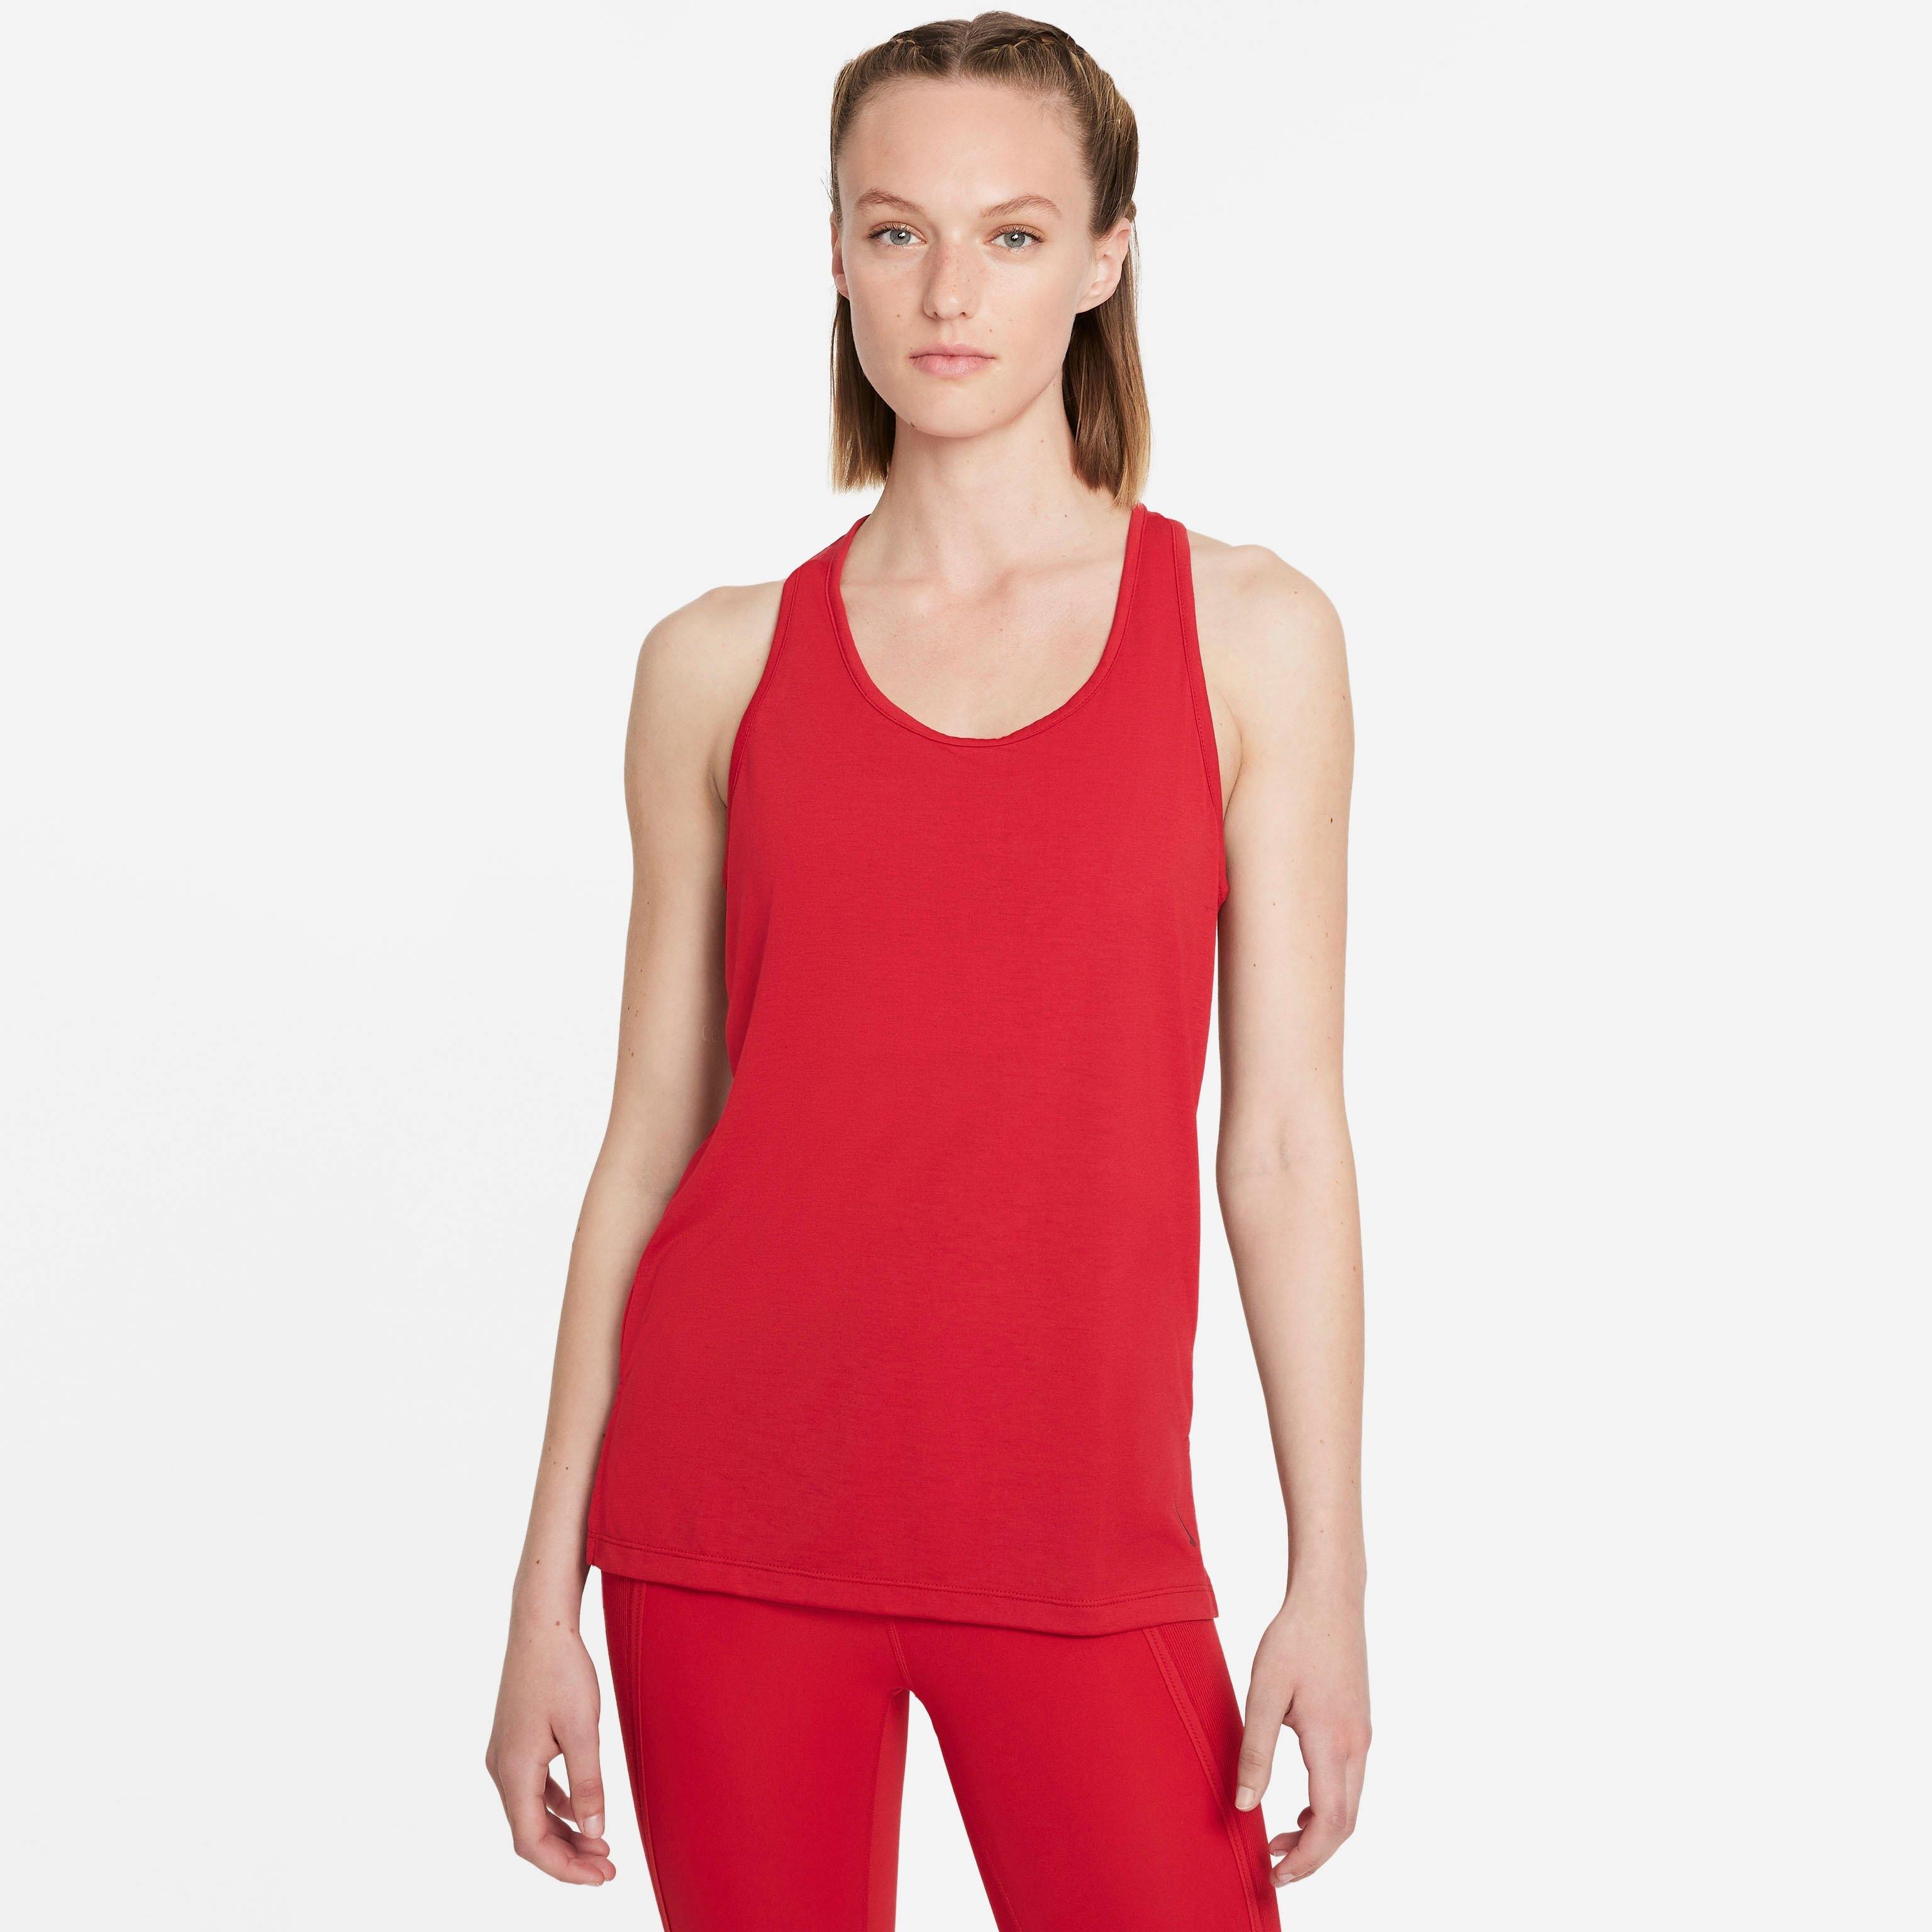 Nike yogatop Nike Yoga Women's Tank - gratis ruilen op otto.nl